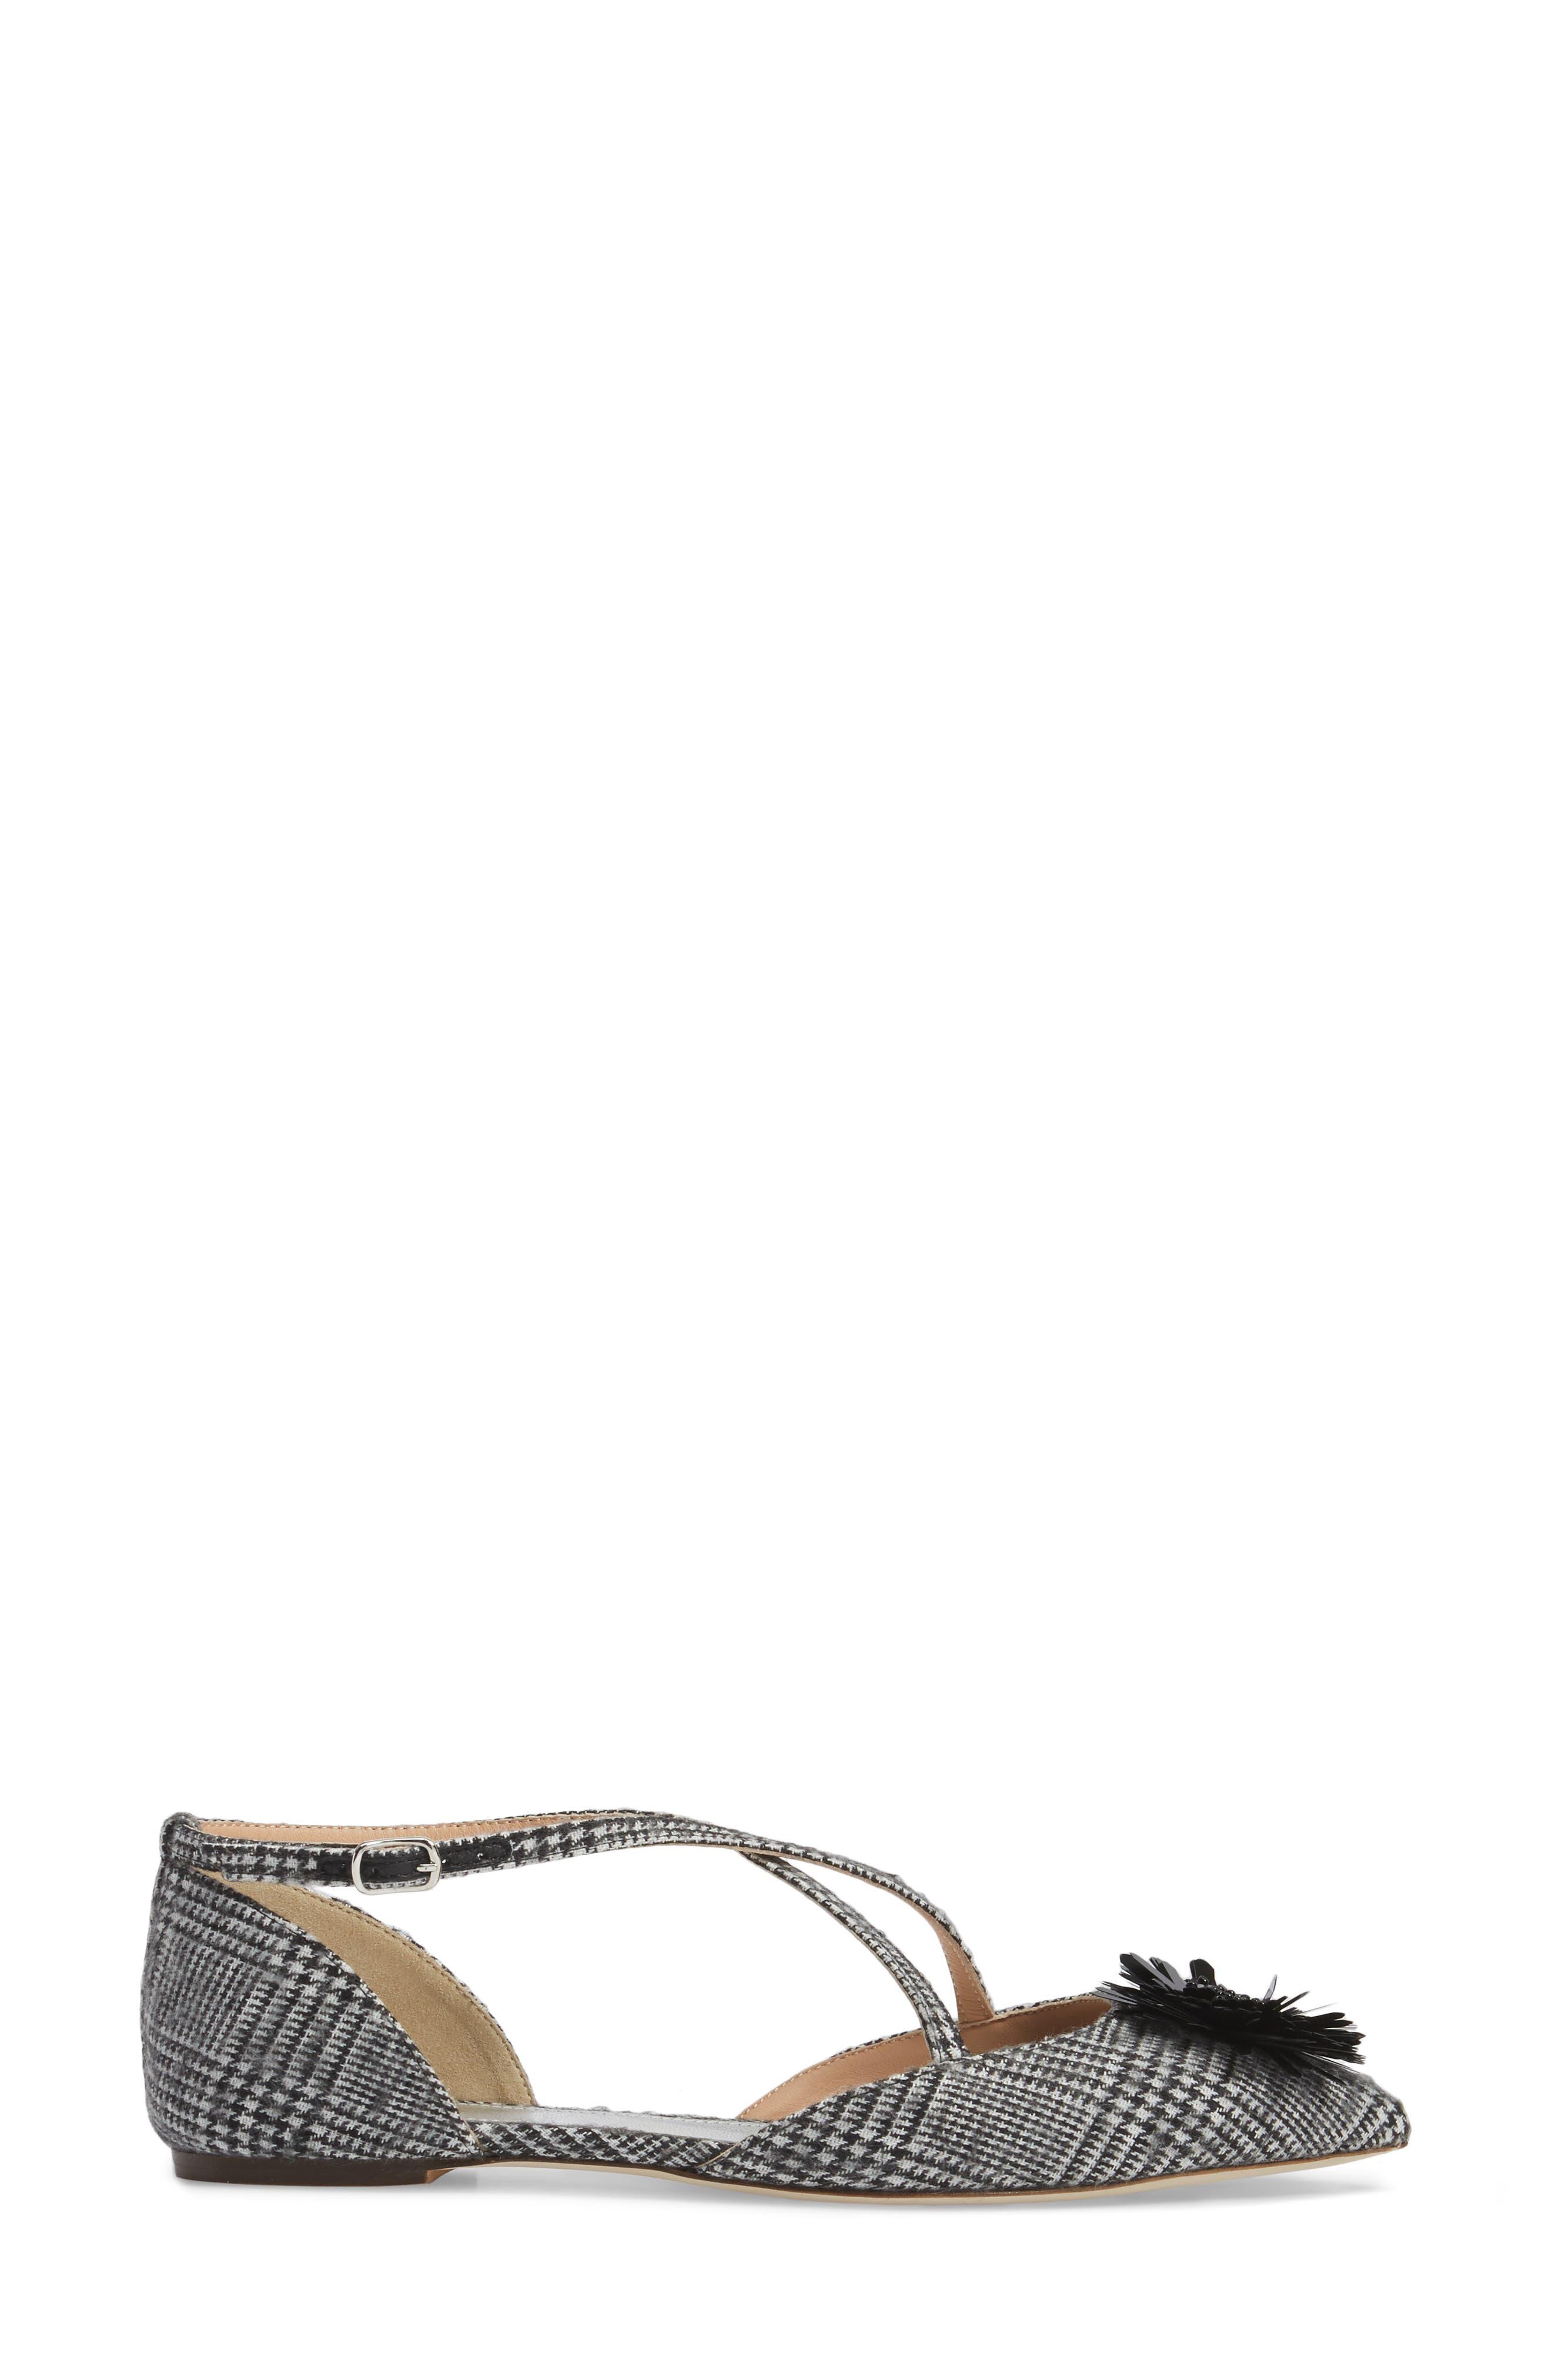 Sadie Cross Strap Pointy Toe Flat,                             Alternate thumbnail 3, color,                             Black/ White Fabric